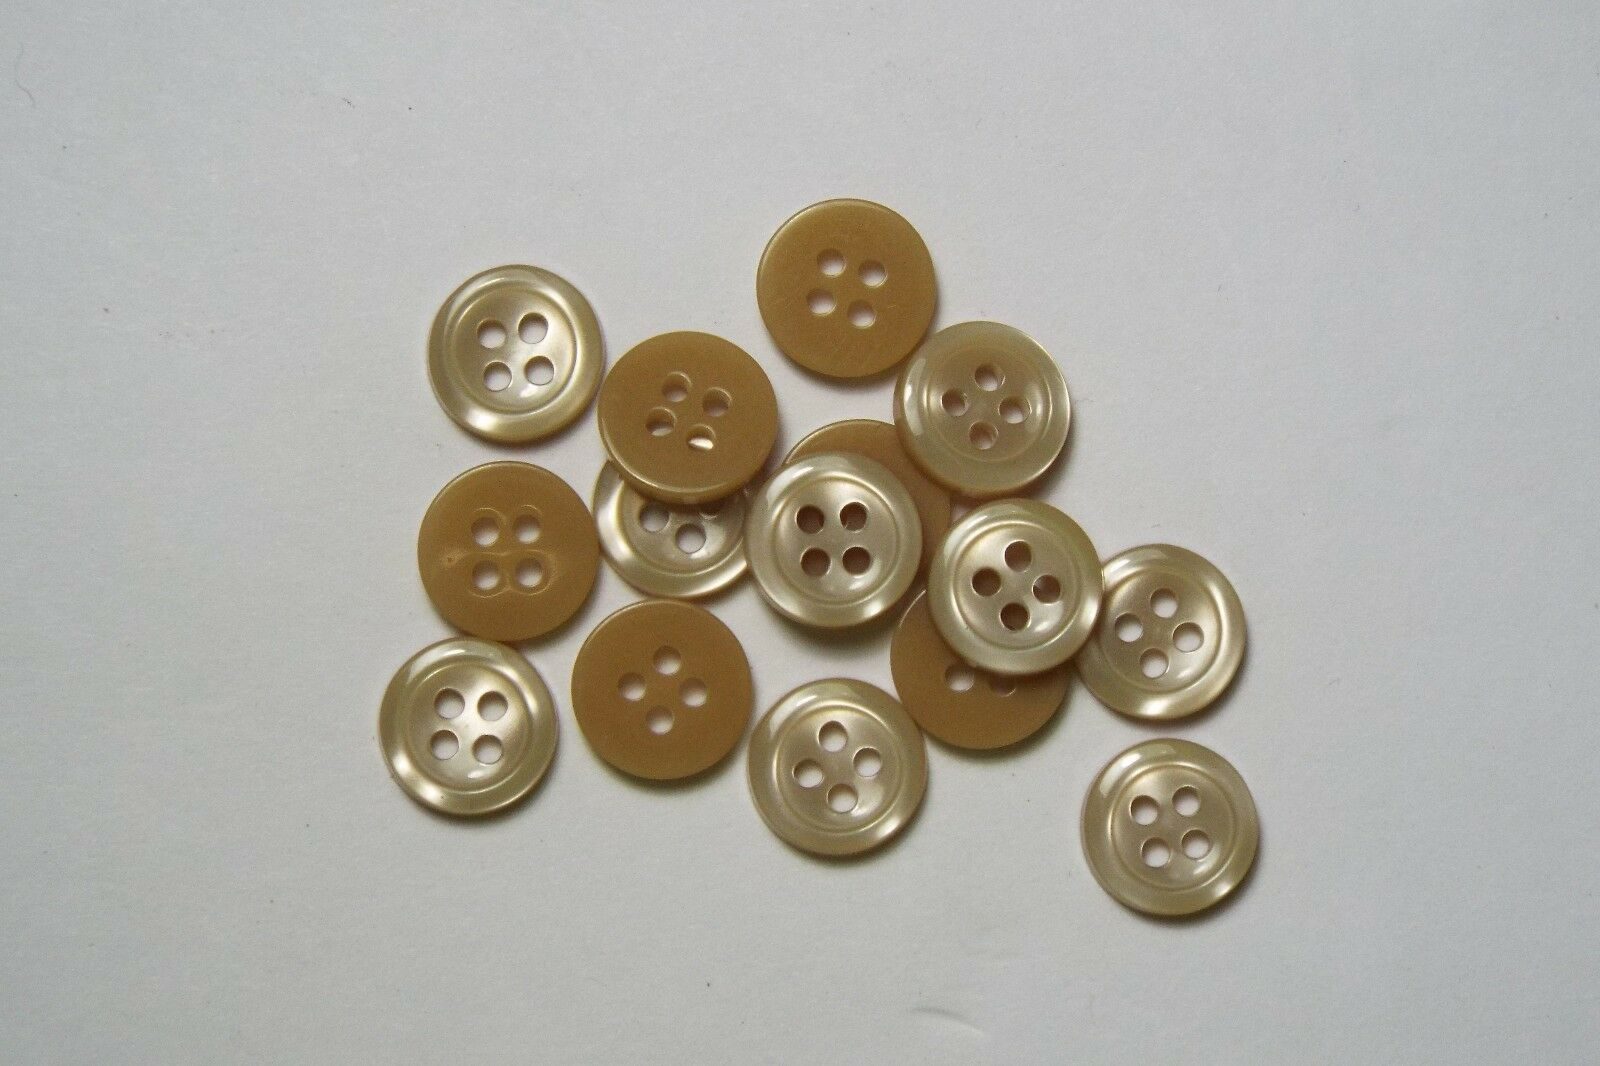 8pc 16mm Brown Cream Mock Bone Square Coat Knitwear Cardigan Baby Button 3169